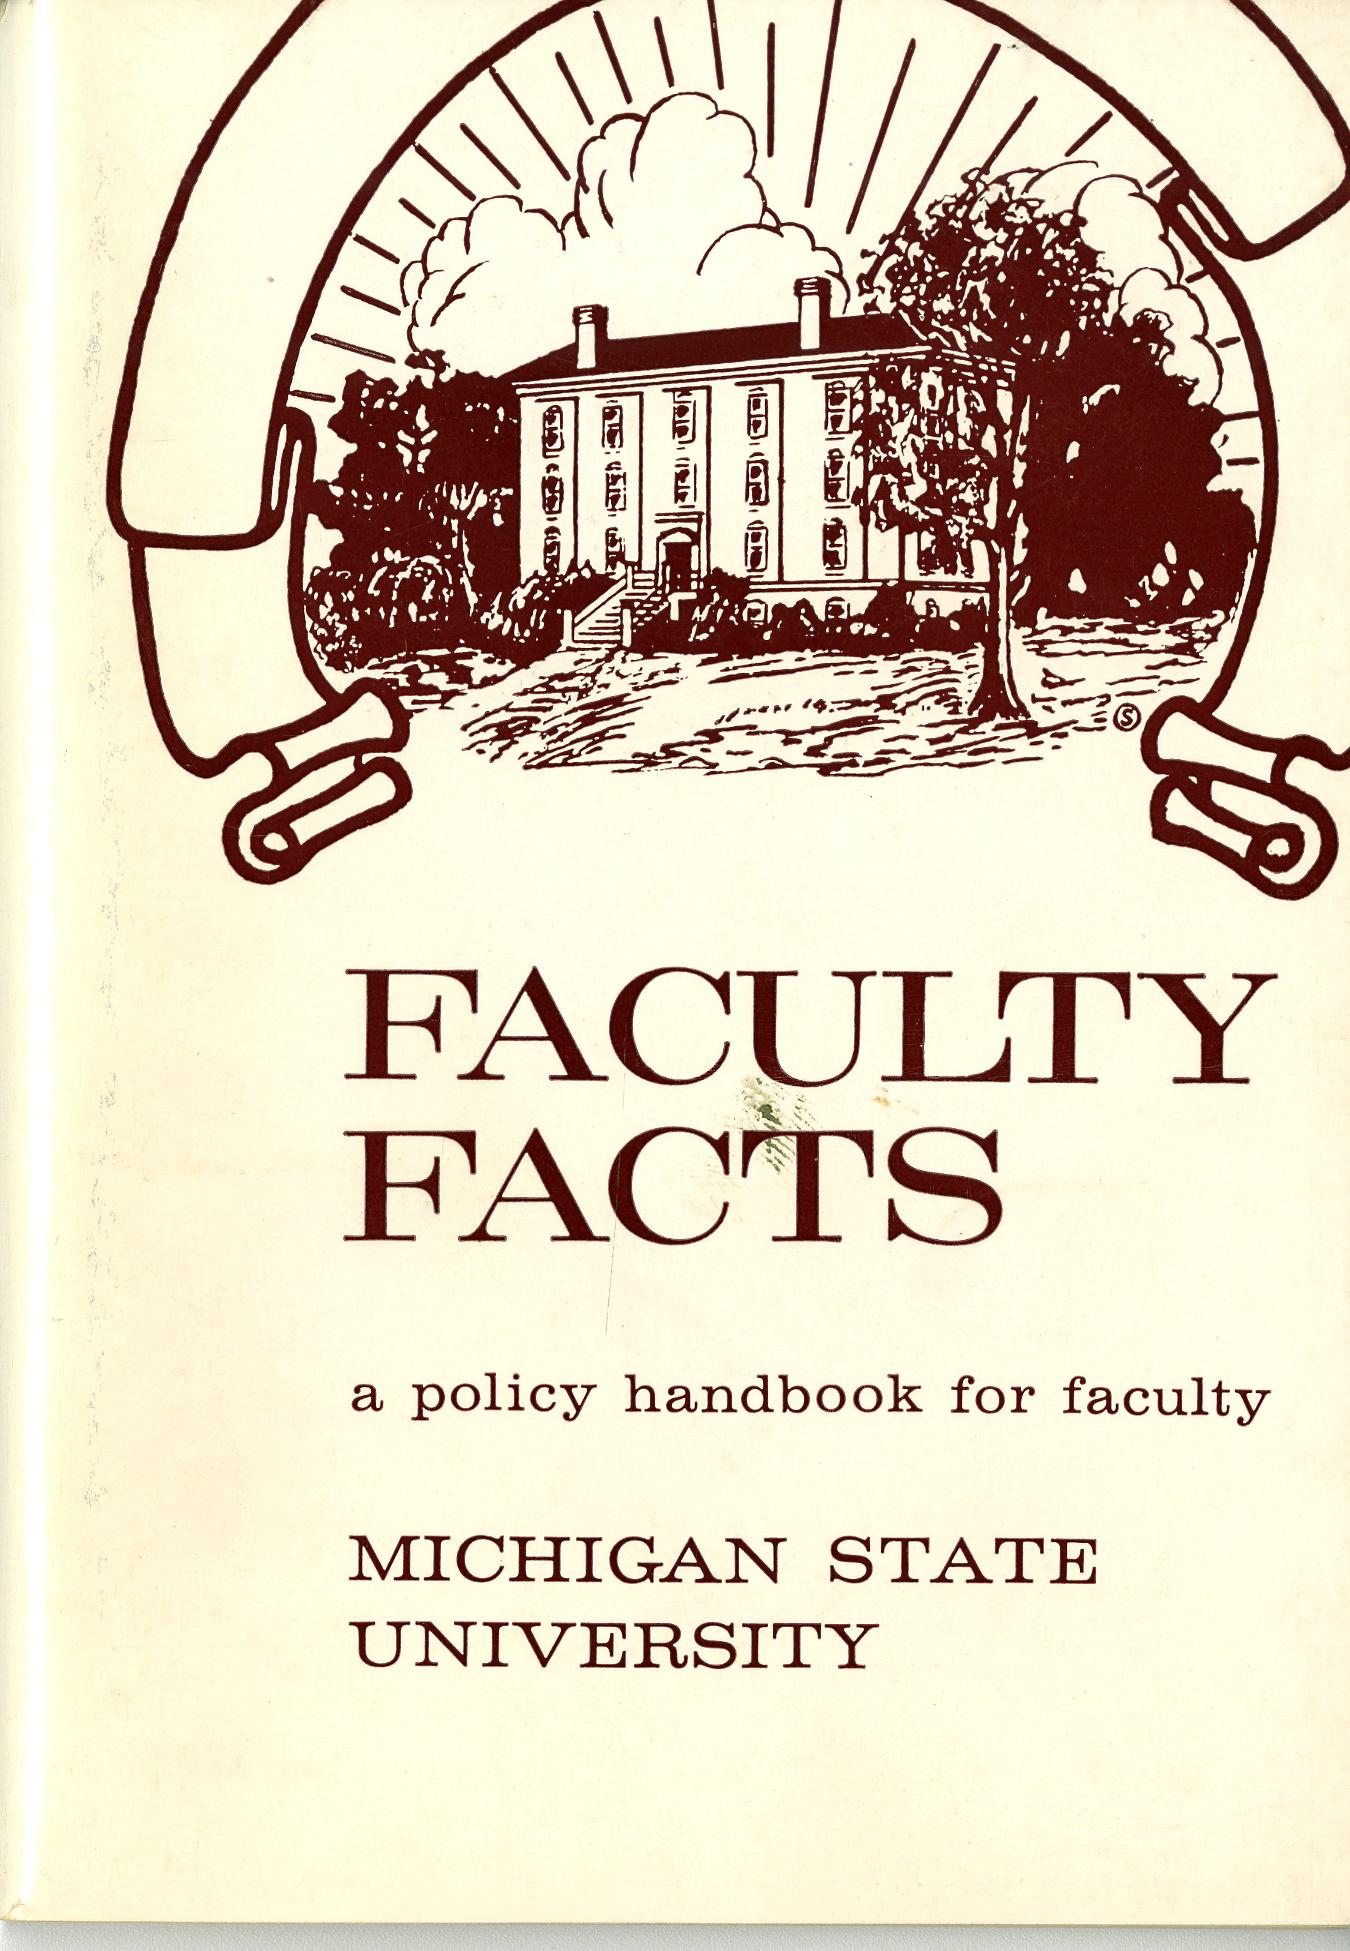 Faculty Handbooks